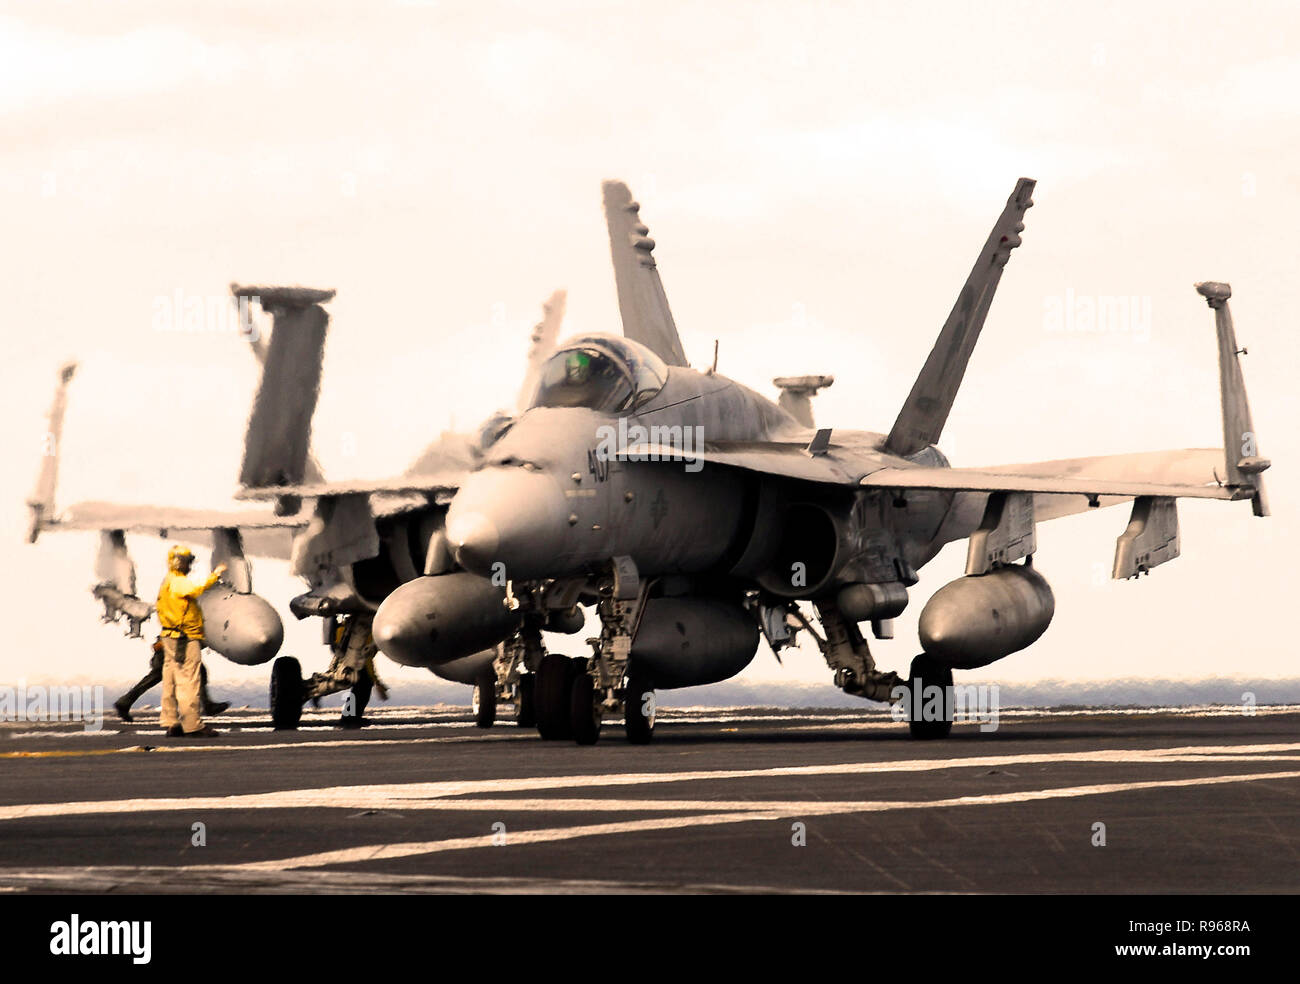 A flight deck director guides an F/A-18C Hornet attached to the Argonauts of Strike Fighter Squadron One Four Seven (VFA- 147) onto the flight deck of the Nimitz-class aircraft carrier USS John C. Stennis (CVN 74).  U.S. Navy photo by Mass Communication Specialist 3rd class Jon Hyde Stock Photo